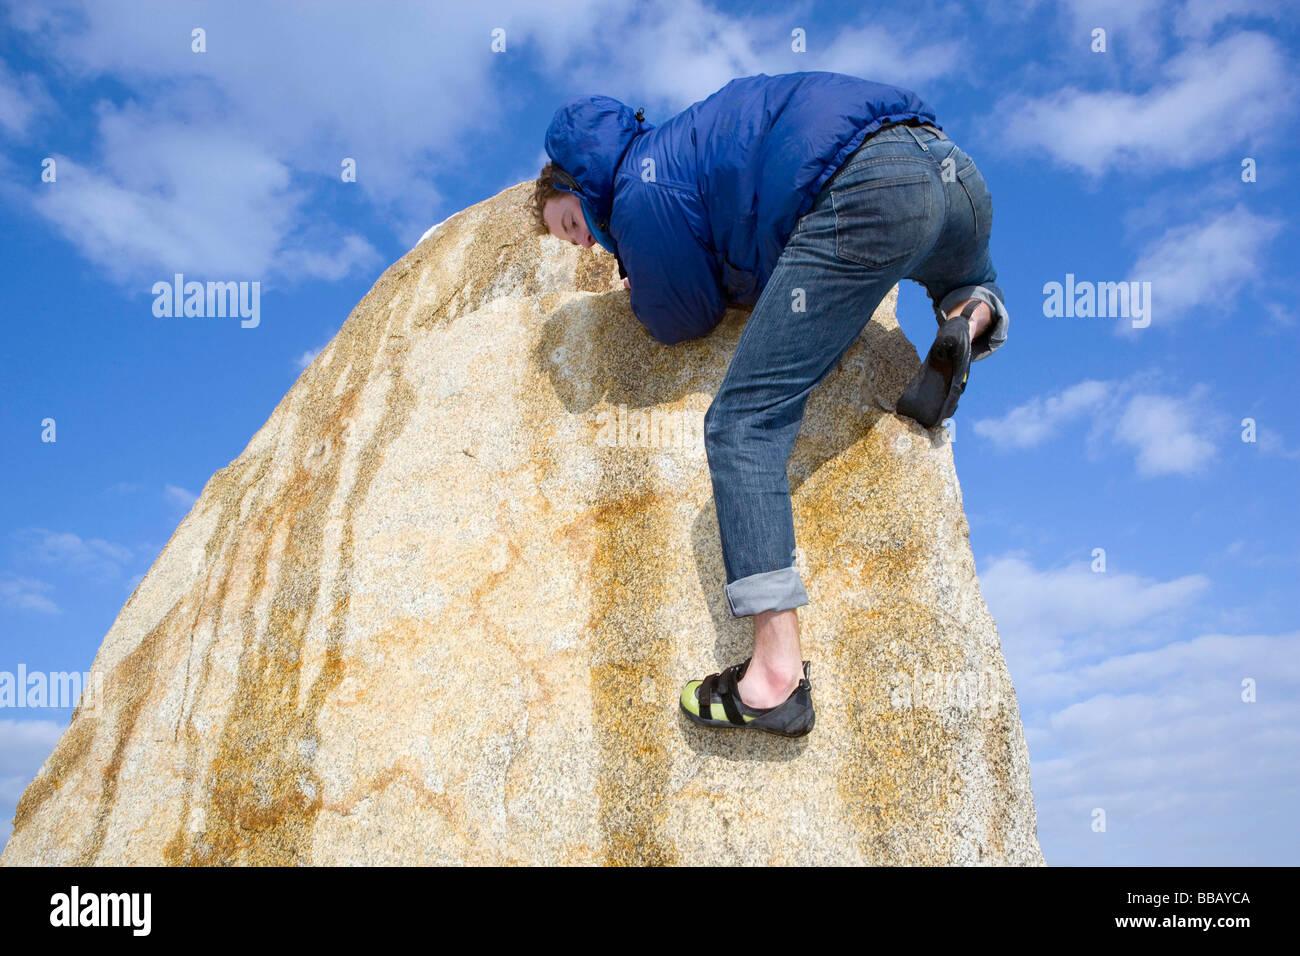 free climbing descending from peak - Stock Image